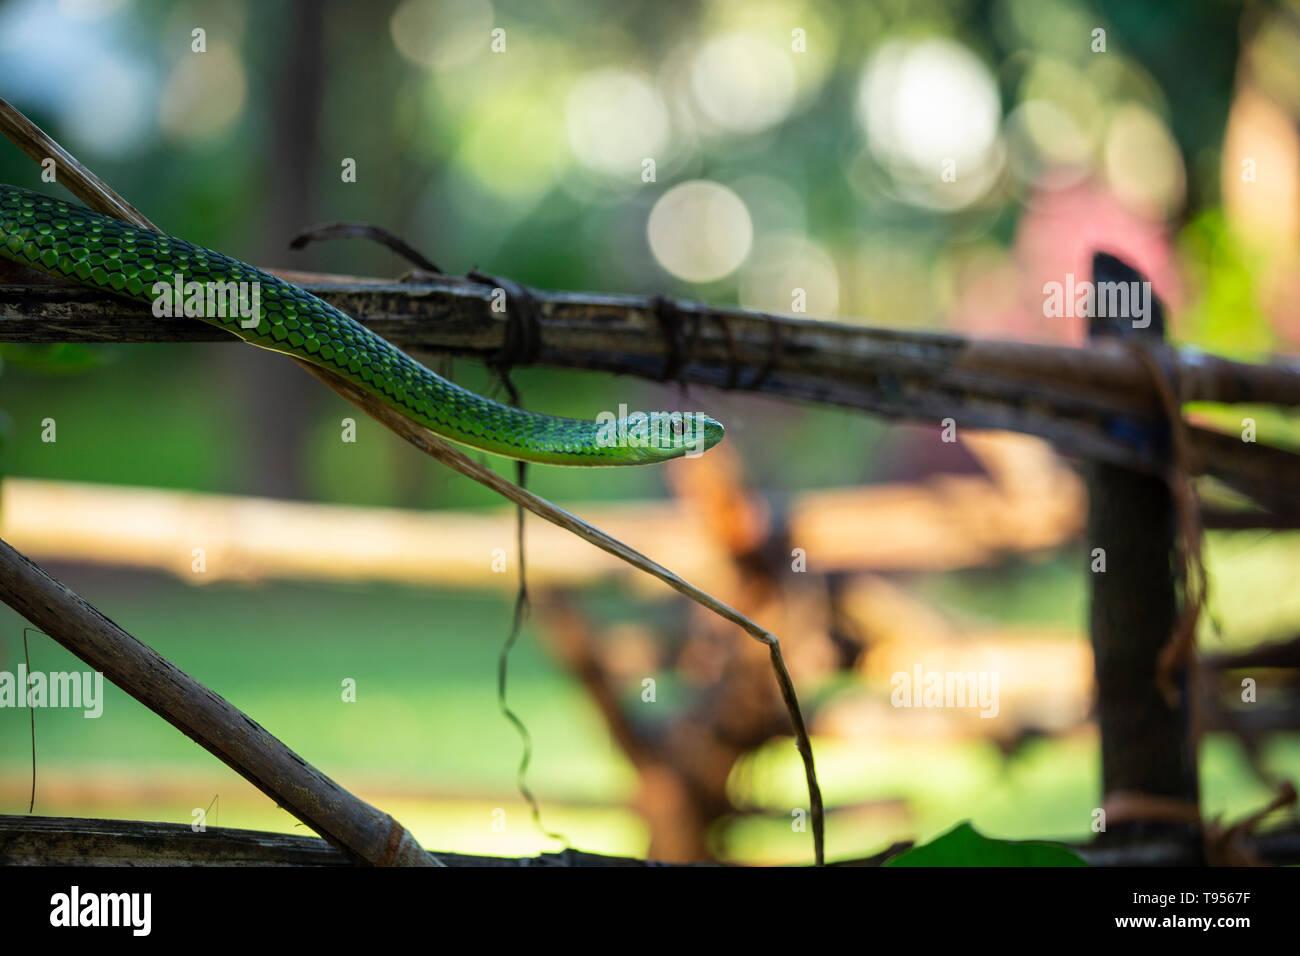 Angola Green Snake/Western Green Snake - Stock Image